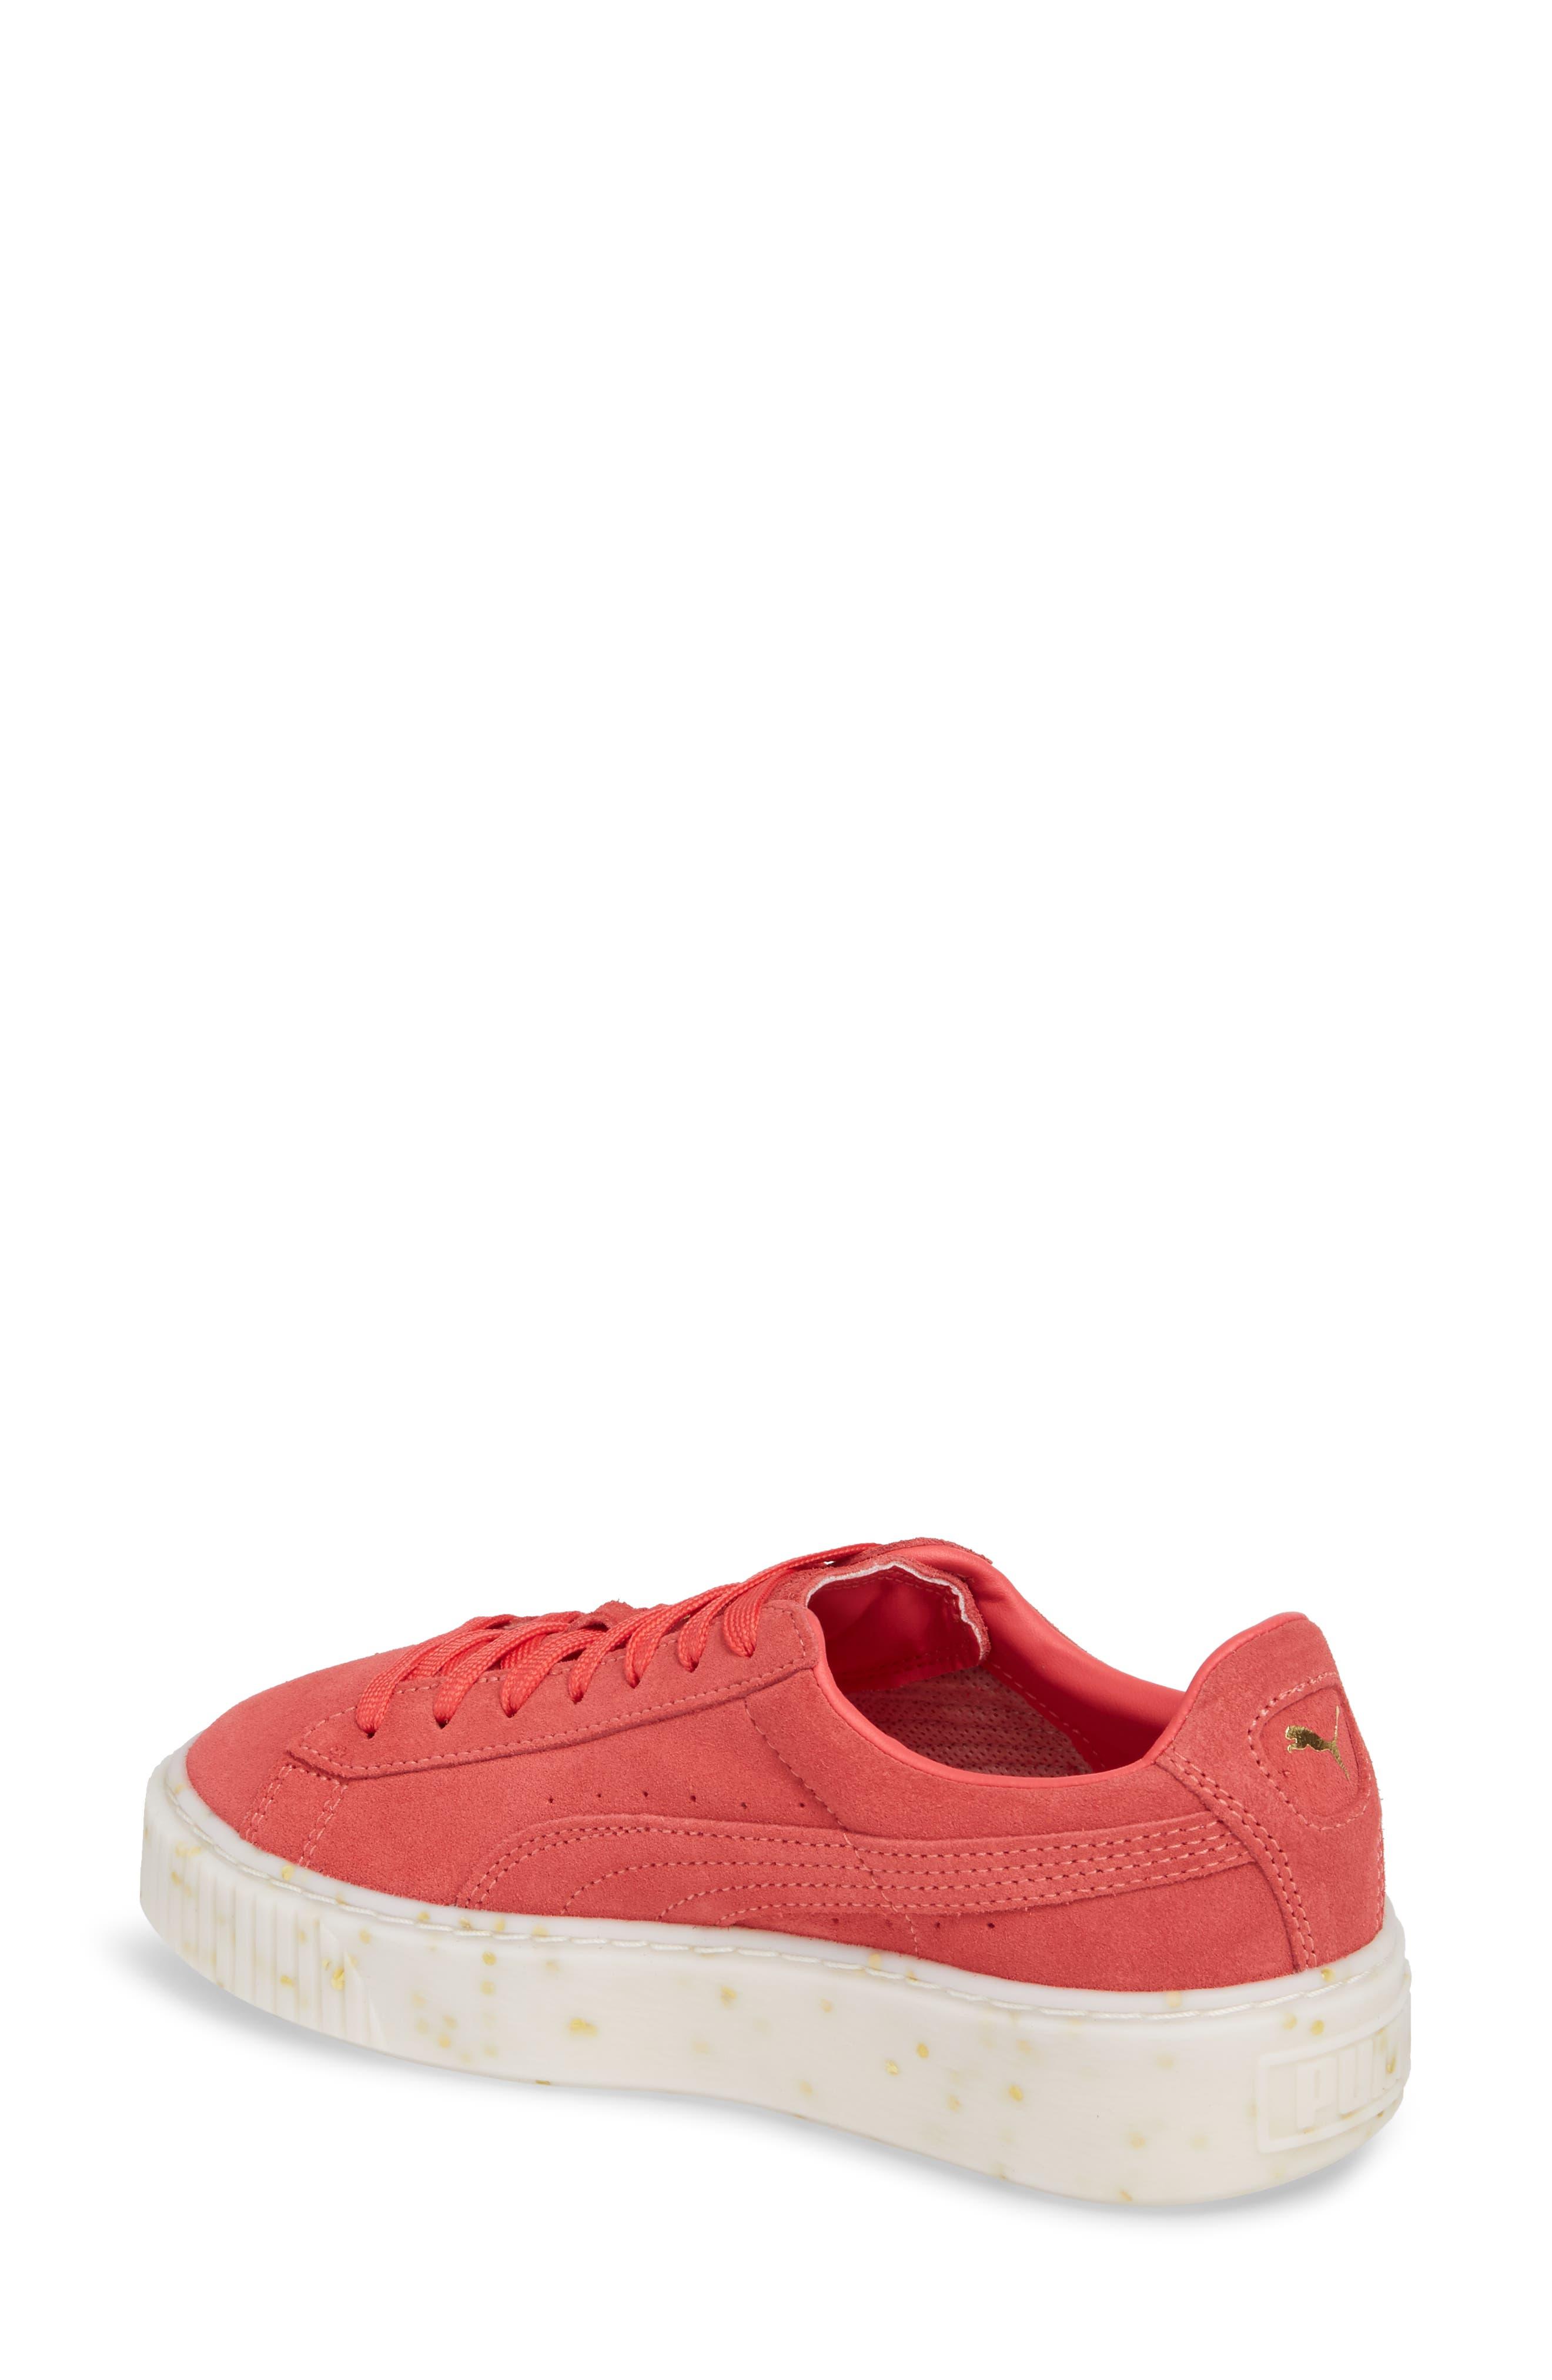 Alternate Image 2  - PUMA Suede Platform Sneaker (Women)